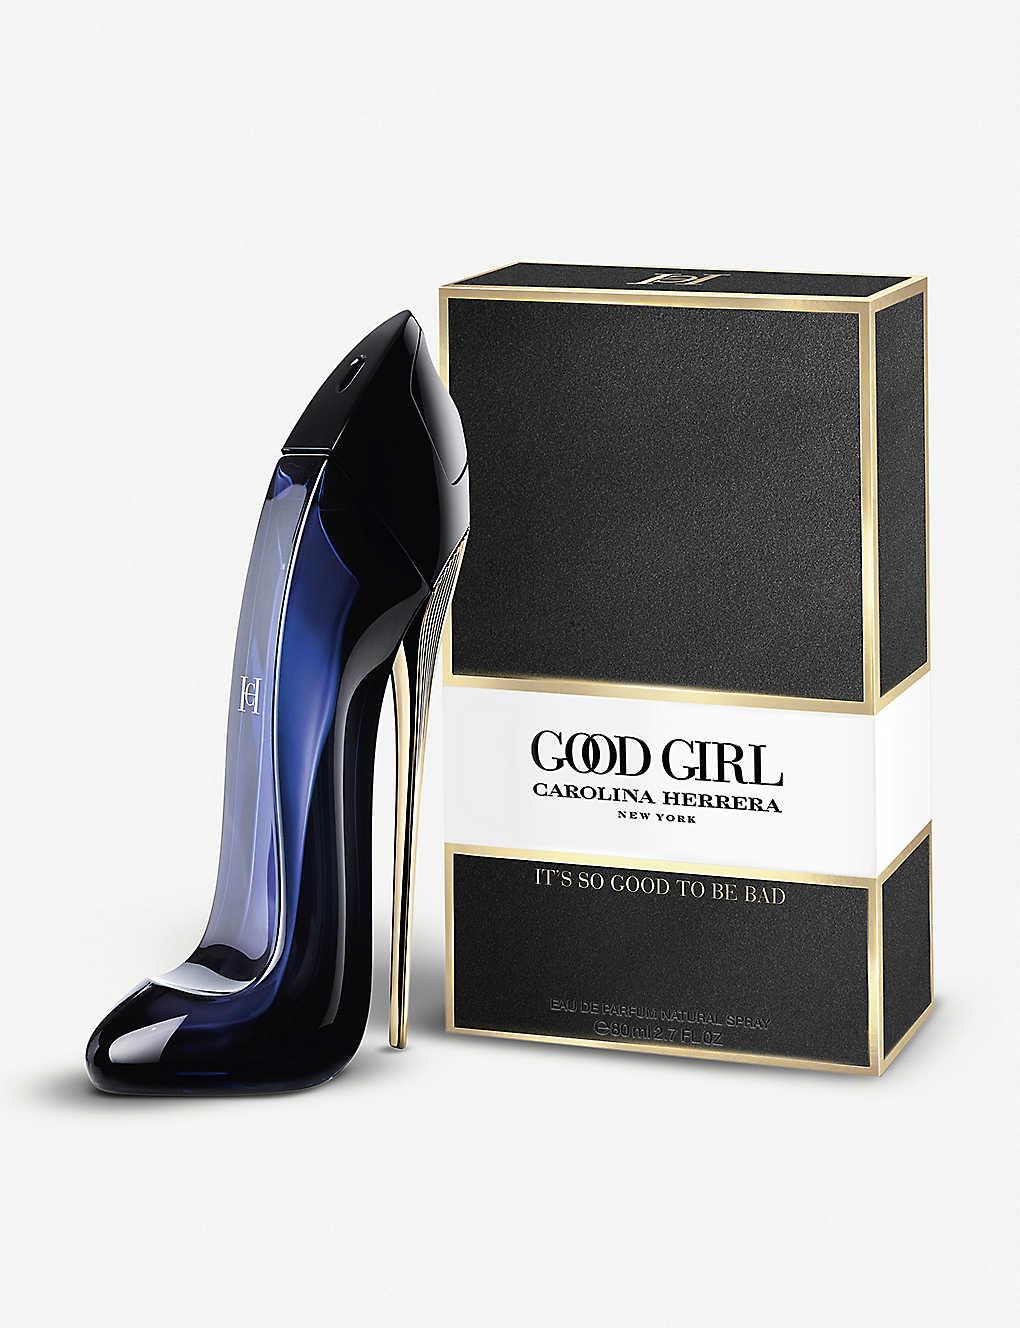 Carolina Herrera Good Girl Eau De Parfum 5080ml Selfridgescom